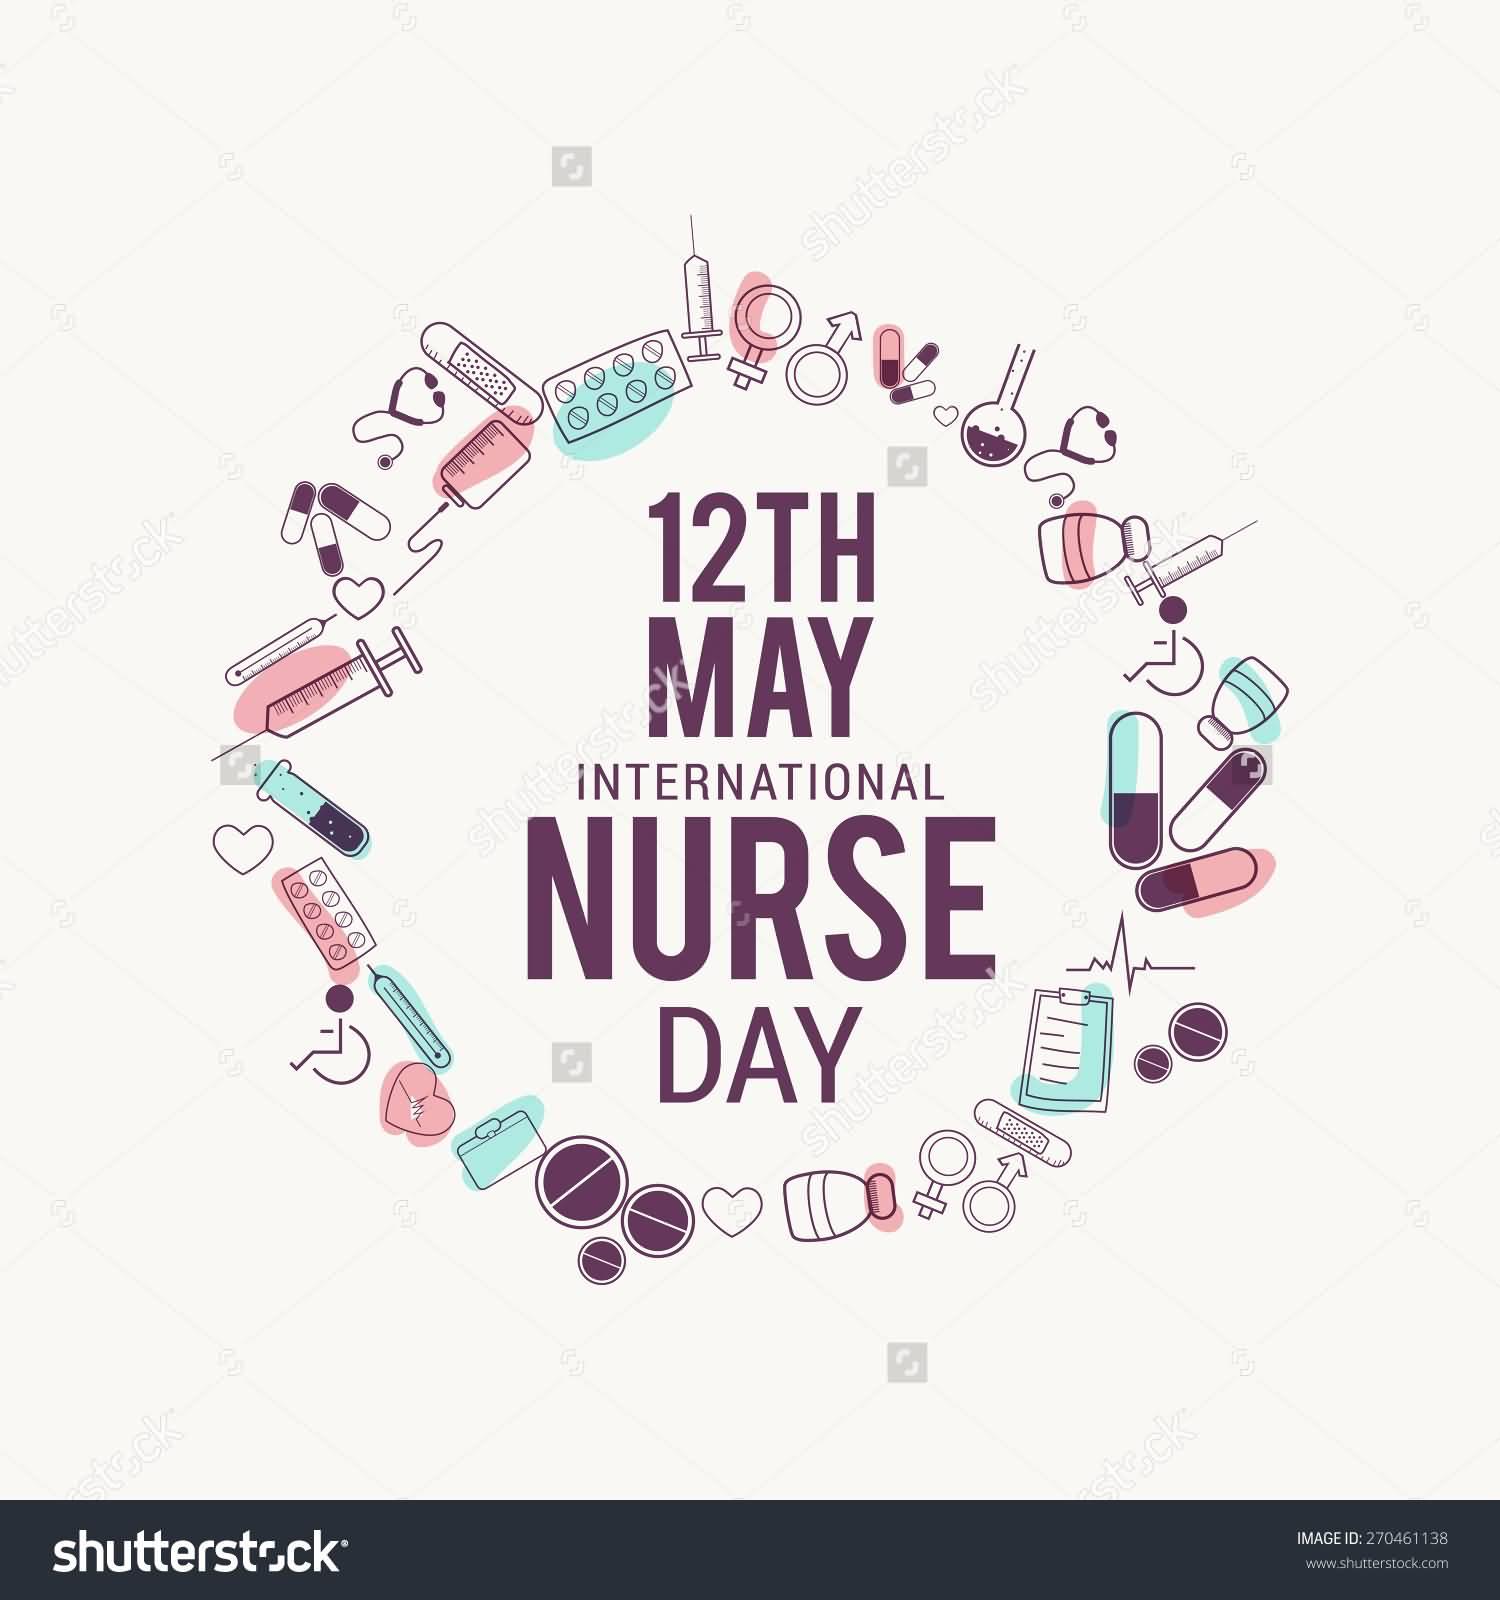 12th May International Nurse Day Illustration